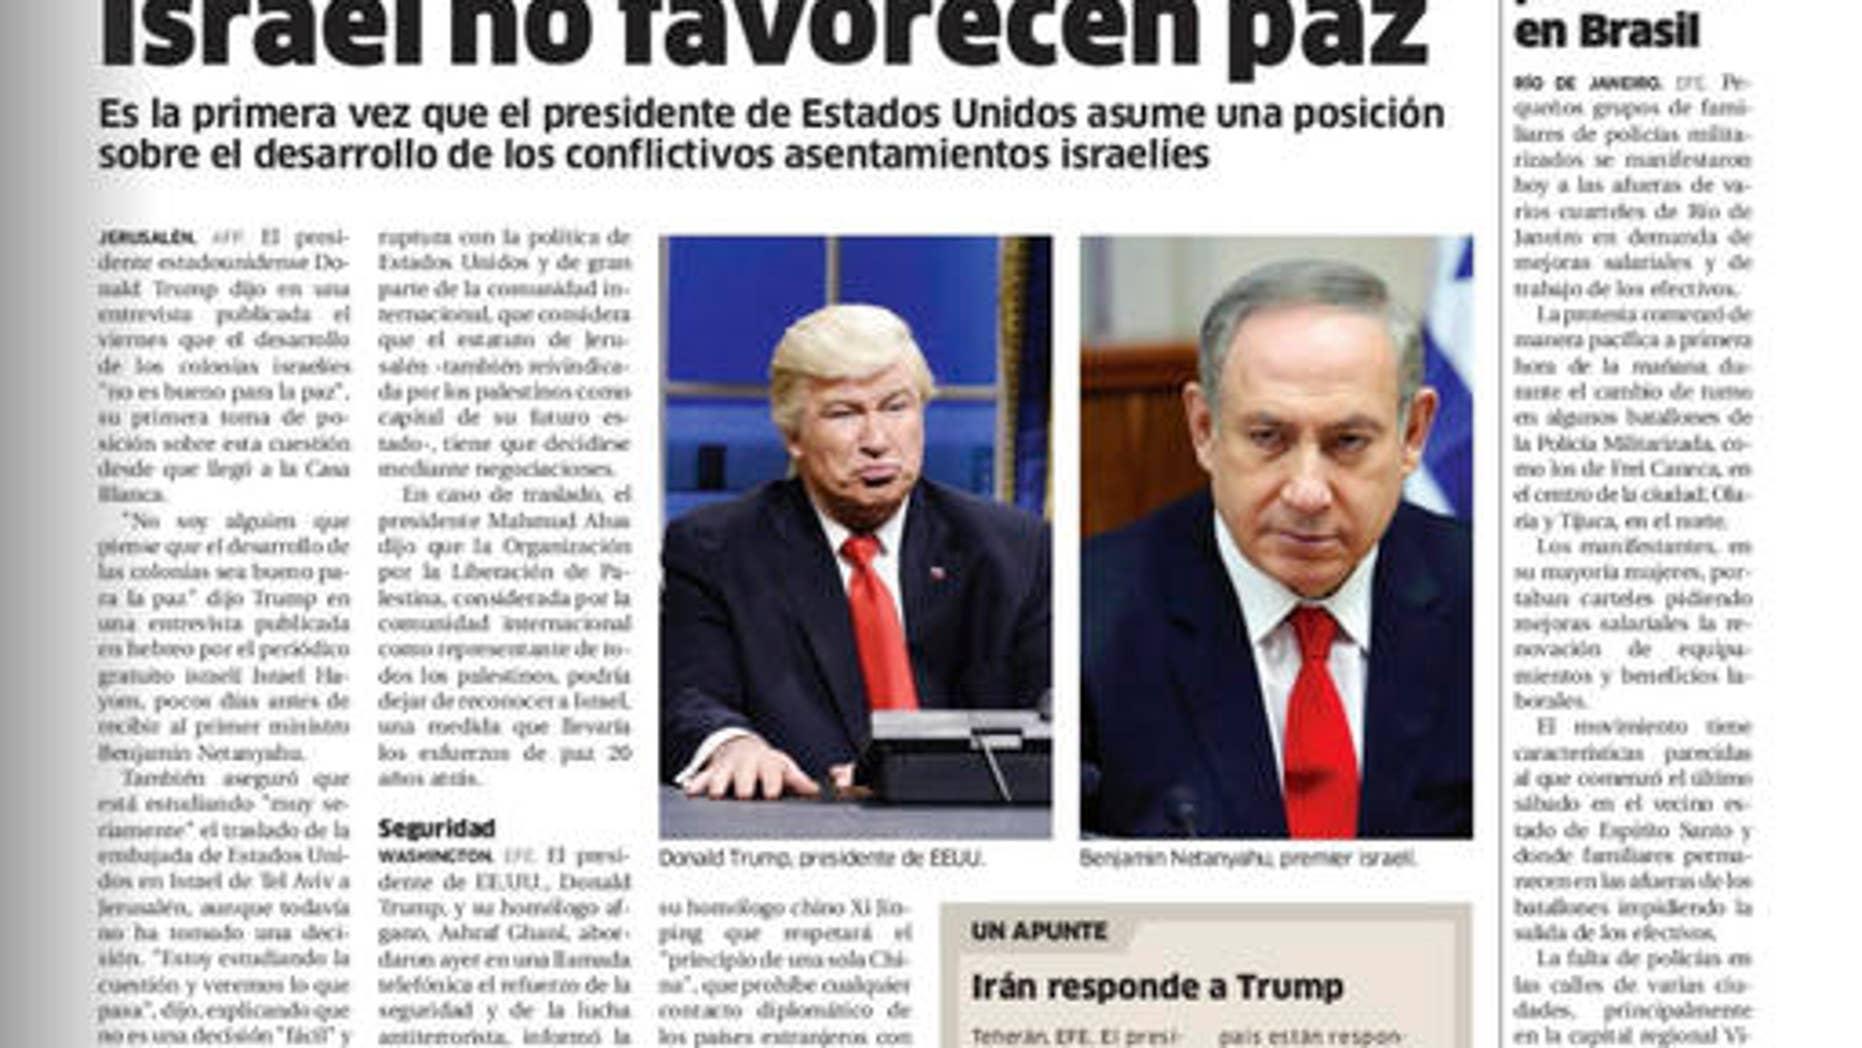 Digitized version of Dominican Republic's El Nacional print edition on Feb. 10, 2017.